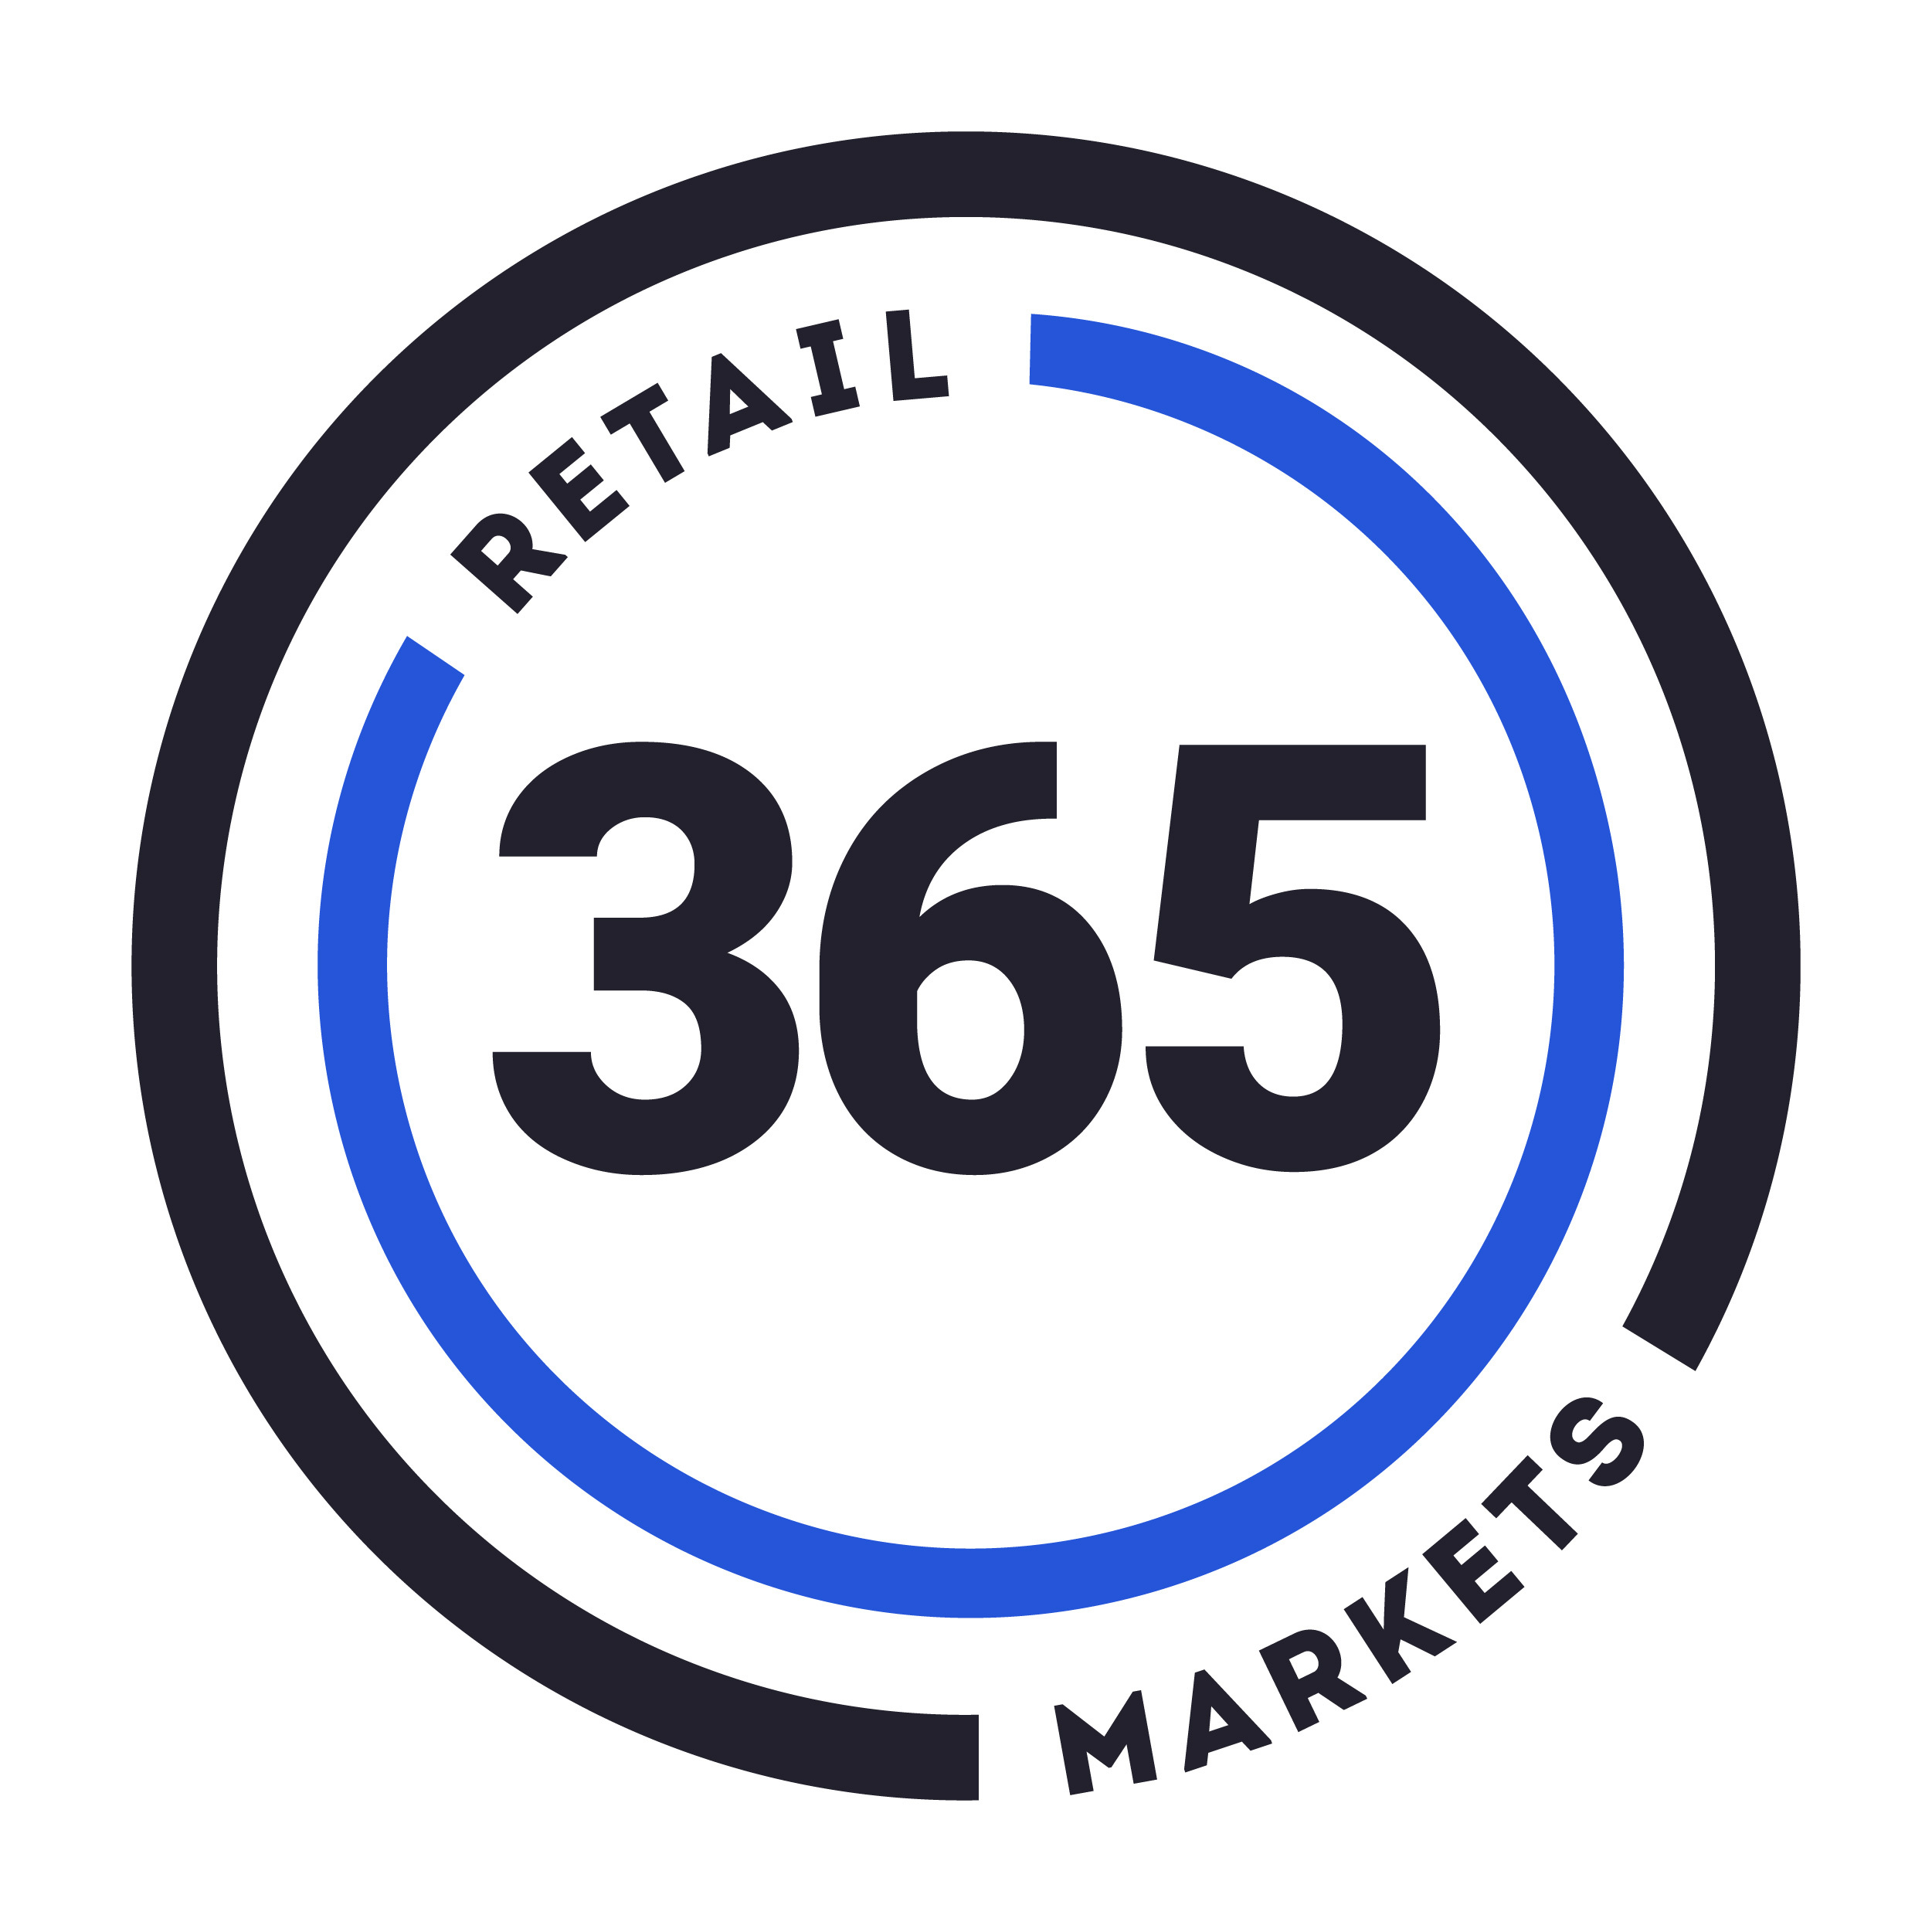 365 Retail Markets logo